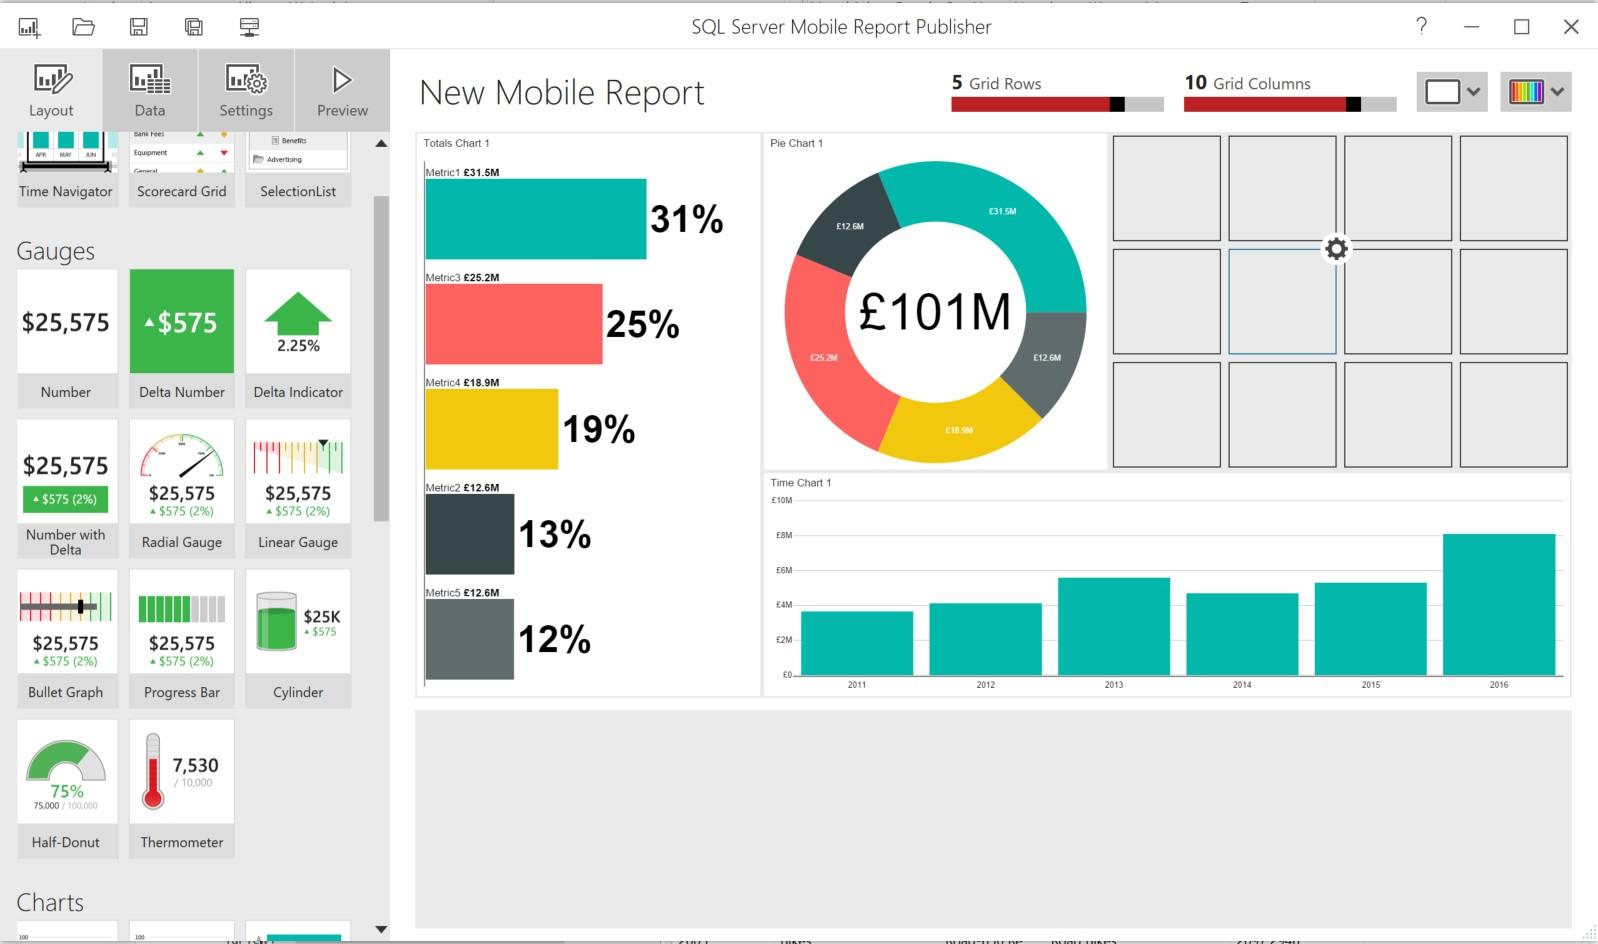 Abbildung 7: SQL Server Mobile Report Publisher